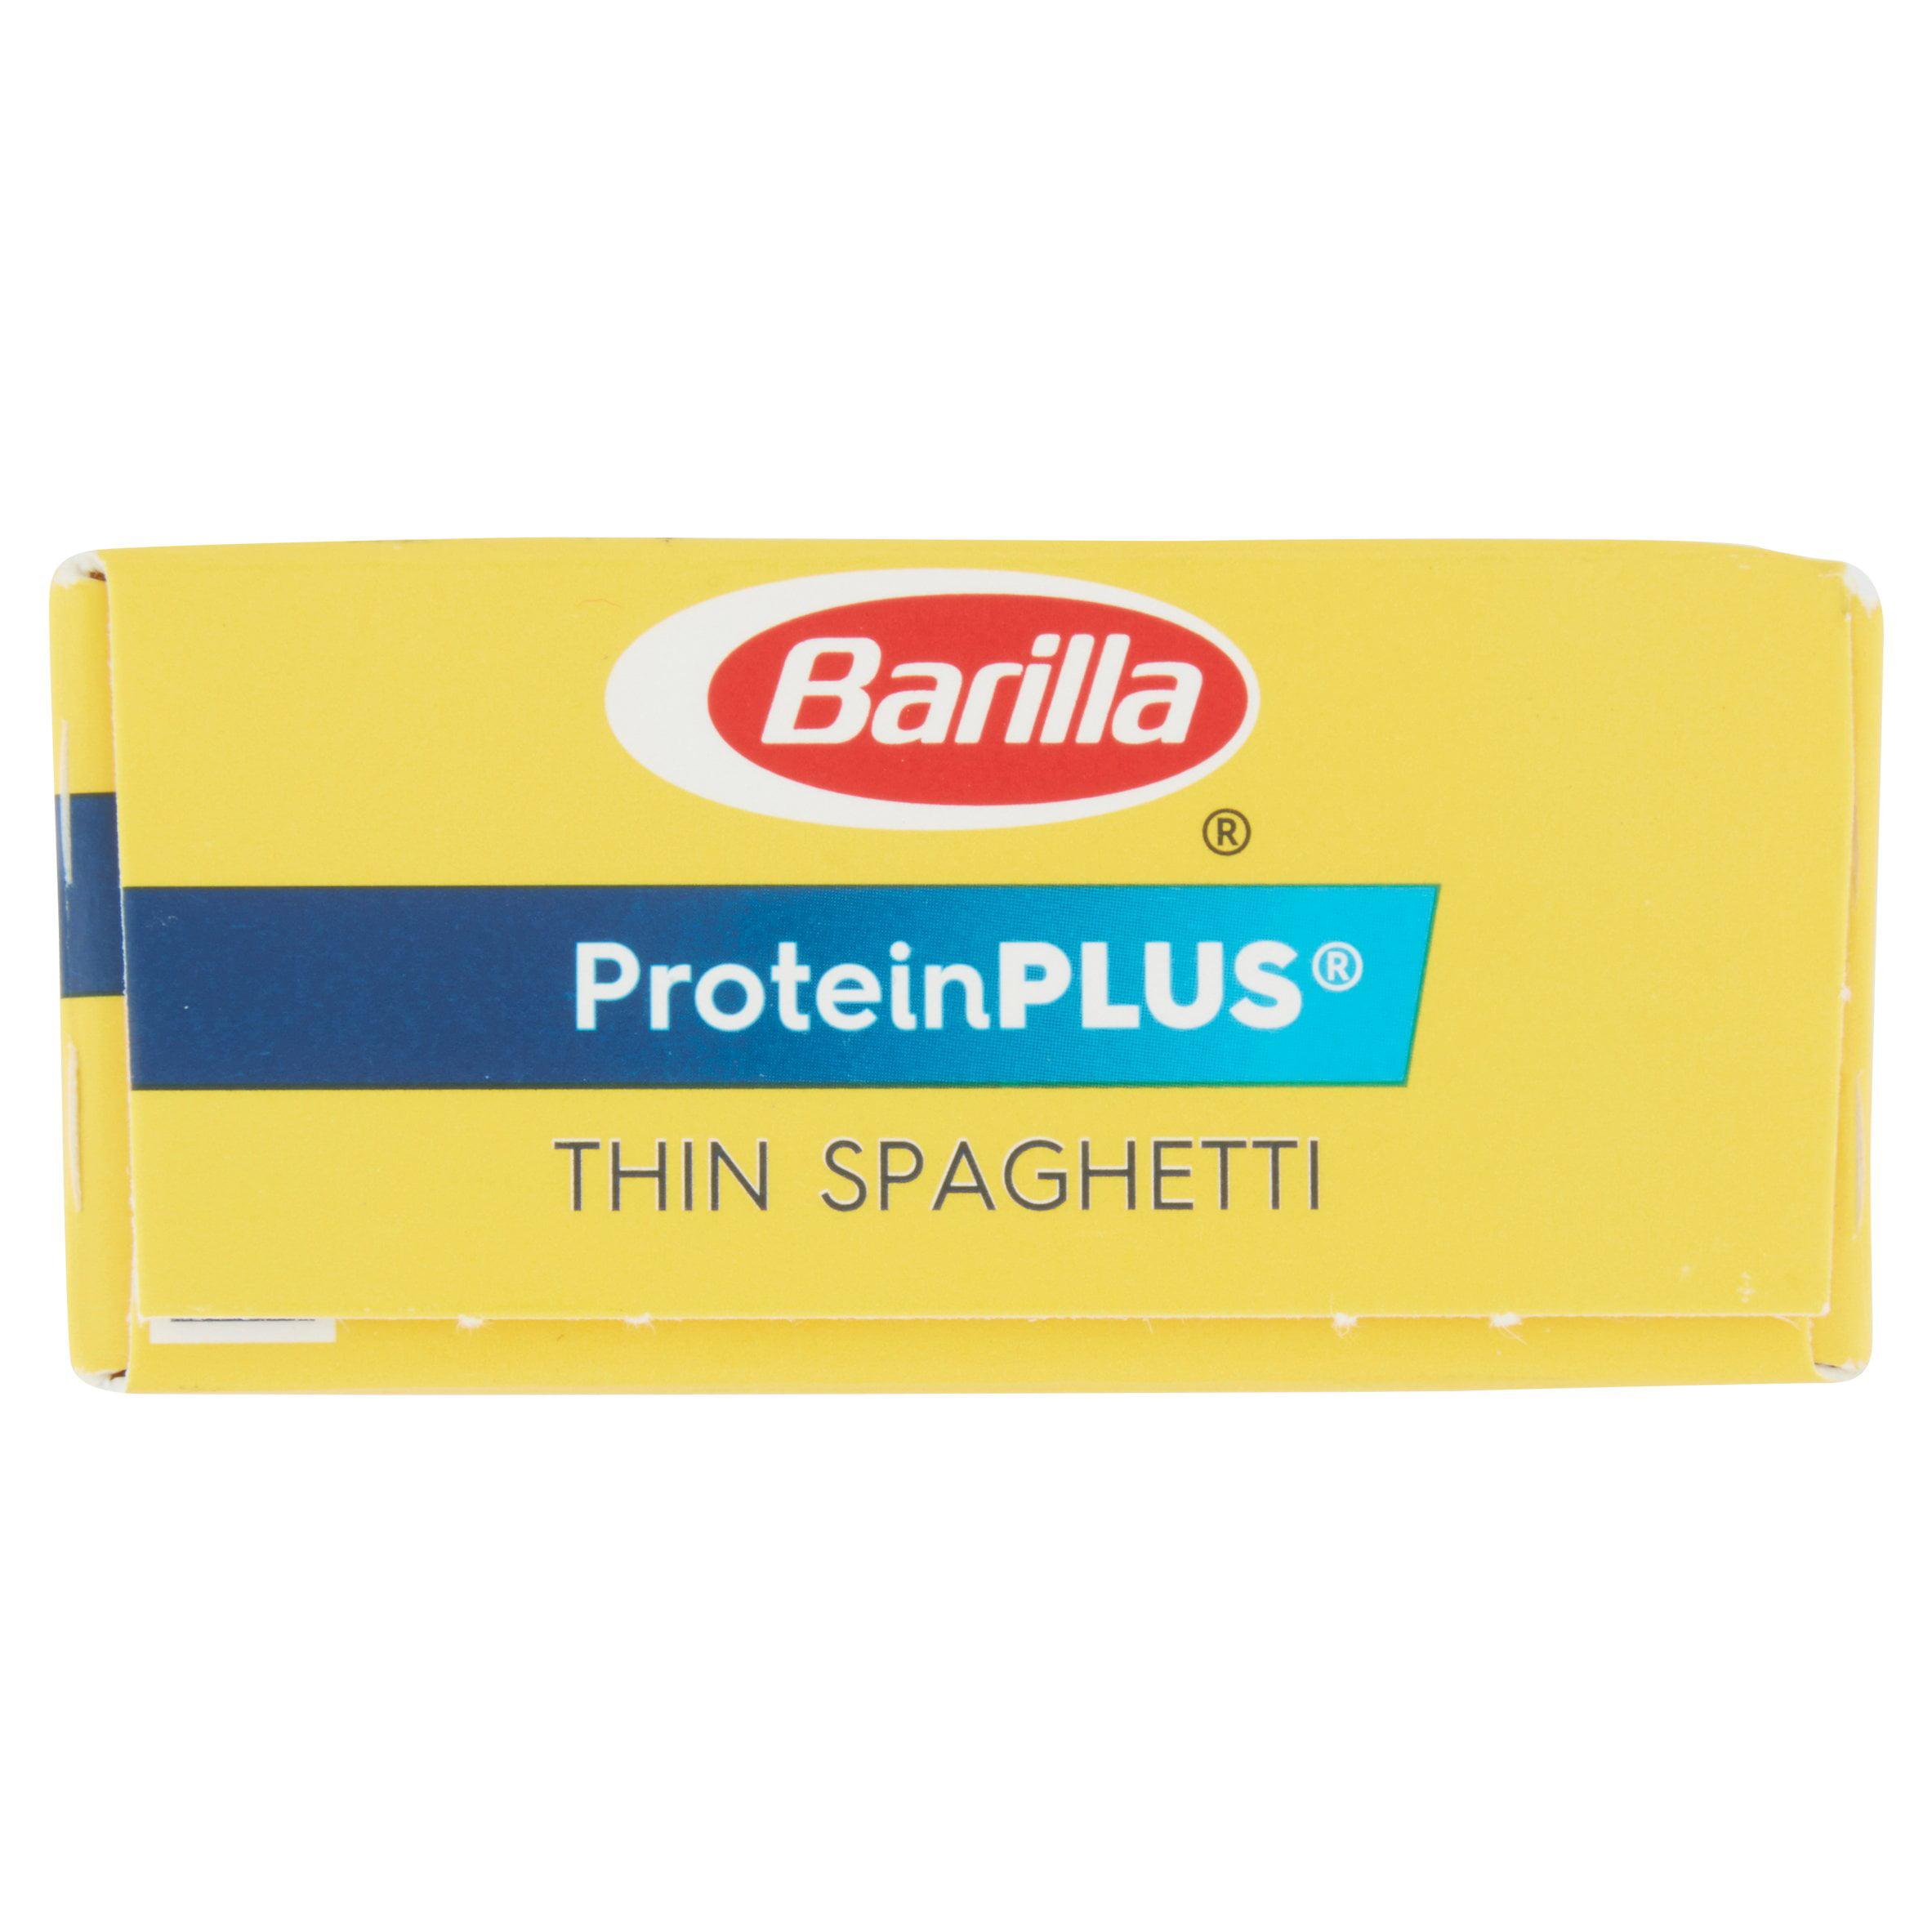 barilla pasta proteinplus thin spaghetti 14 5 oz walmart com